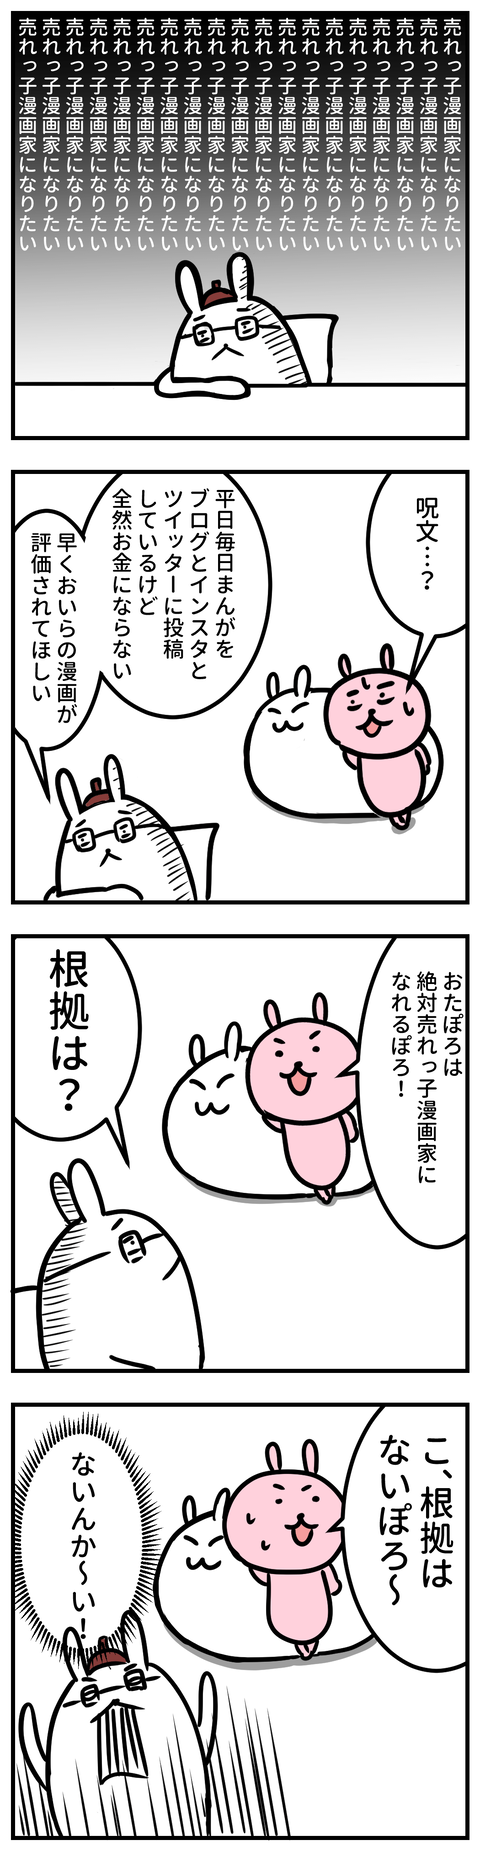 manga-yuzuporo42-1